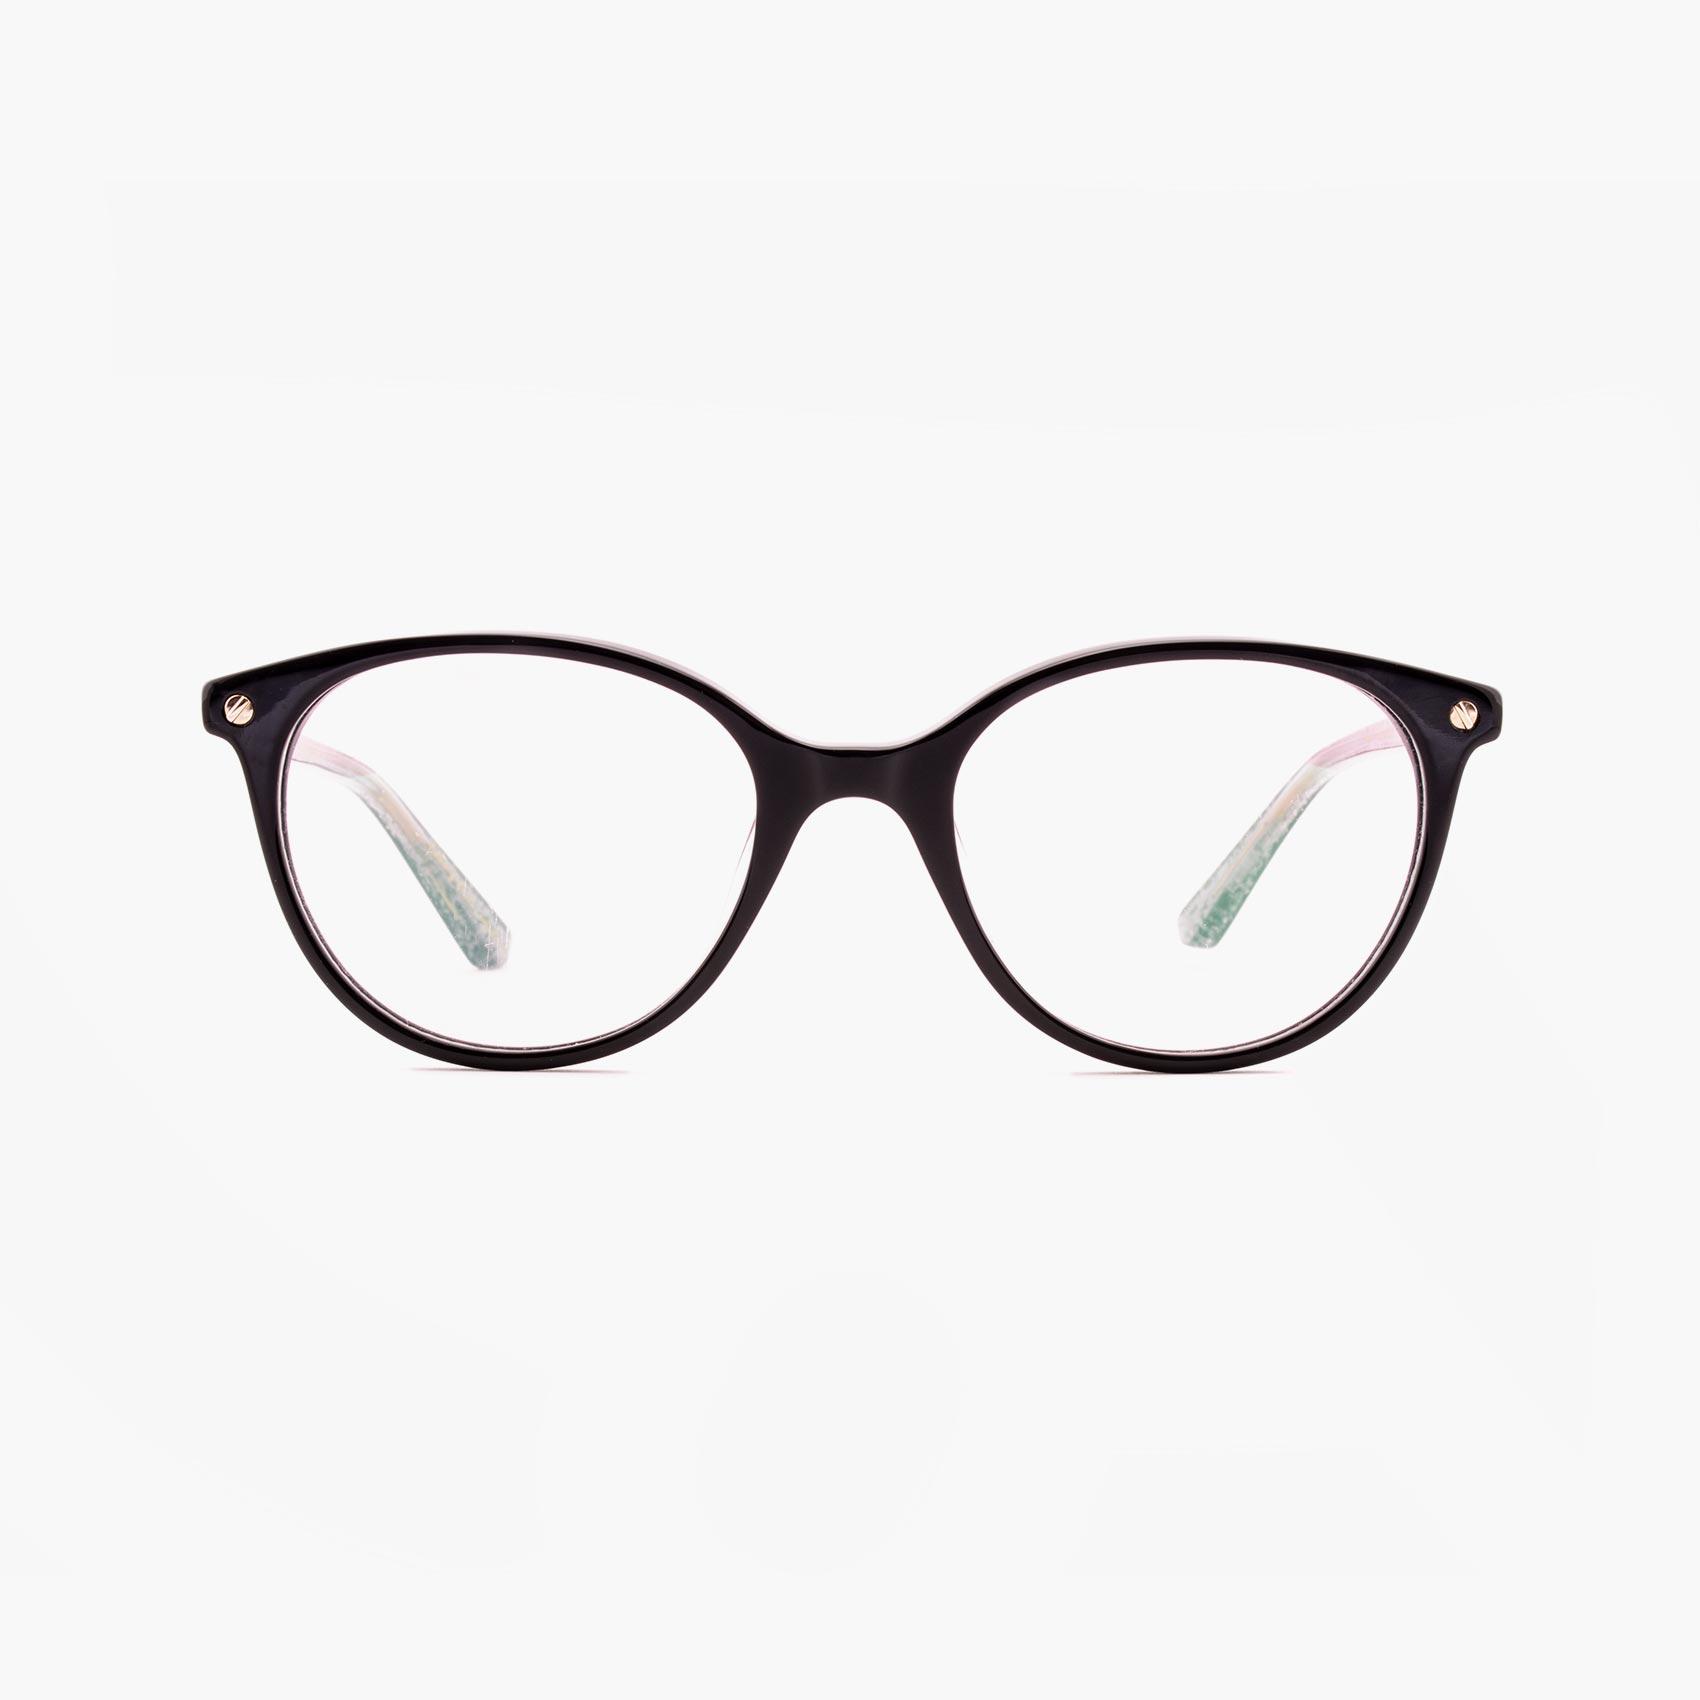 Proud eyewear Charlize C1 F gafas de acetato mujer negras